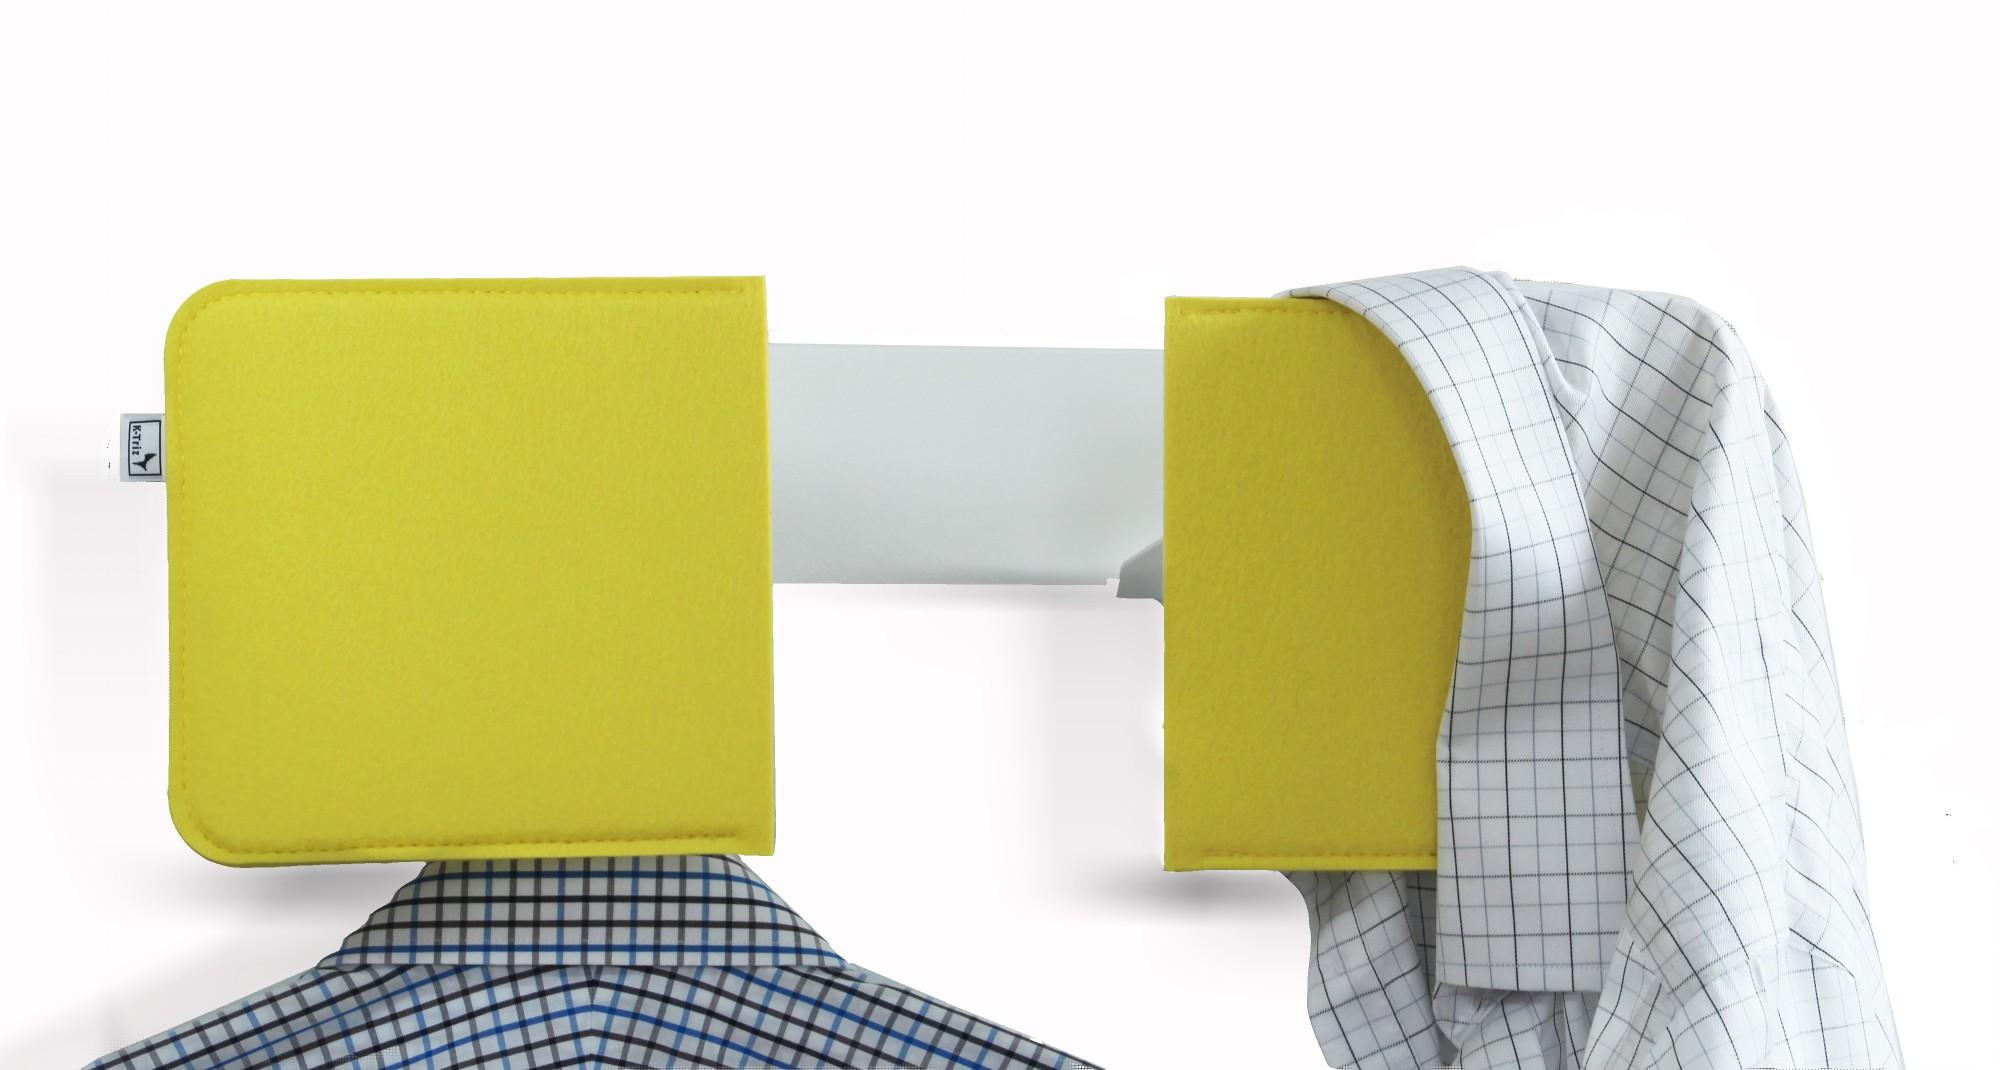 damendiener herrendiener gelb weiss stummer diener design ponalto. Black Bedroom Furniture Sets. Home Design Ideas